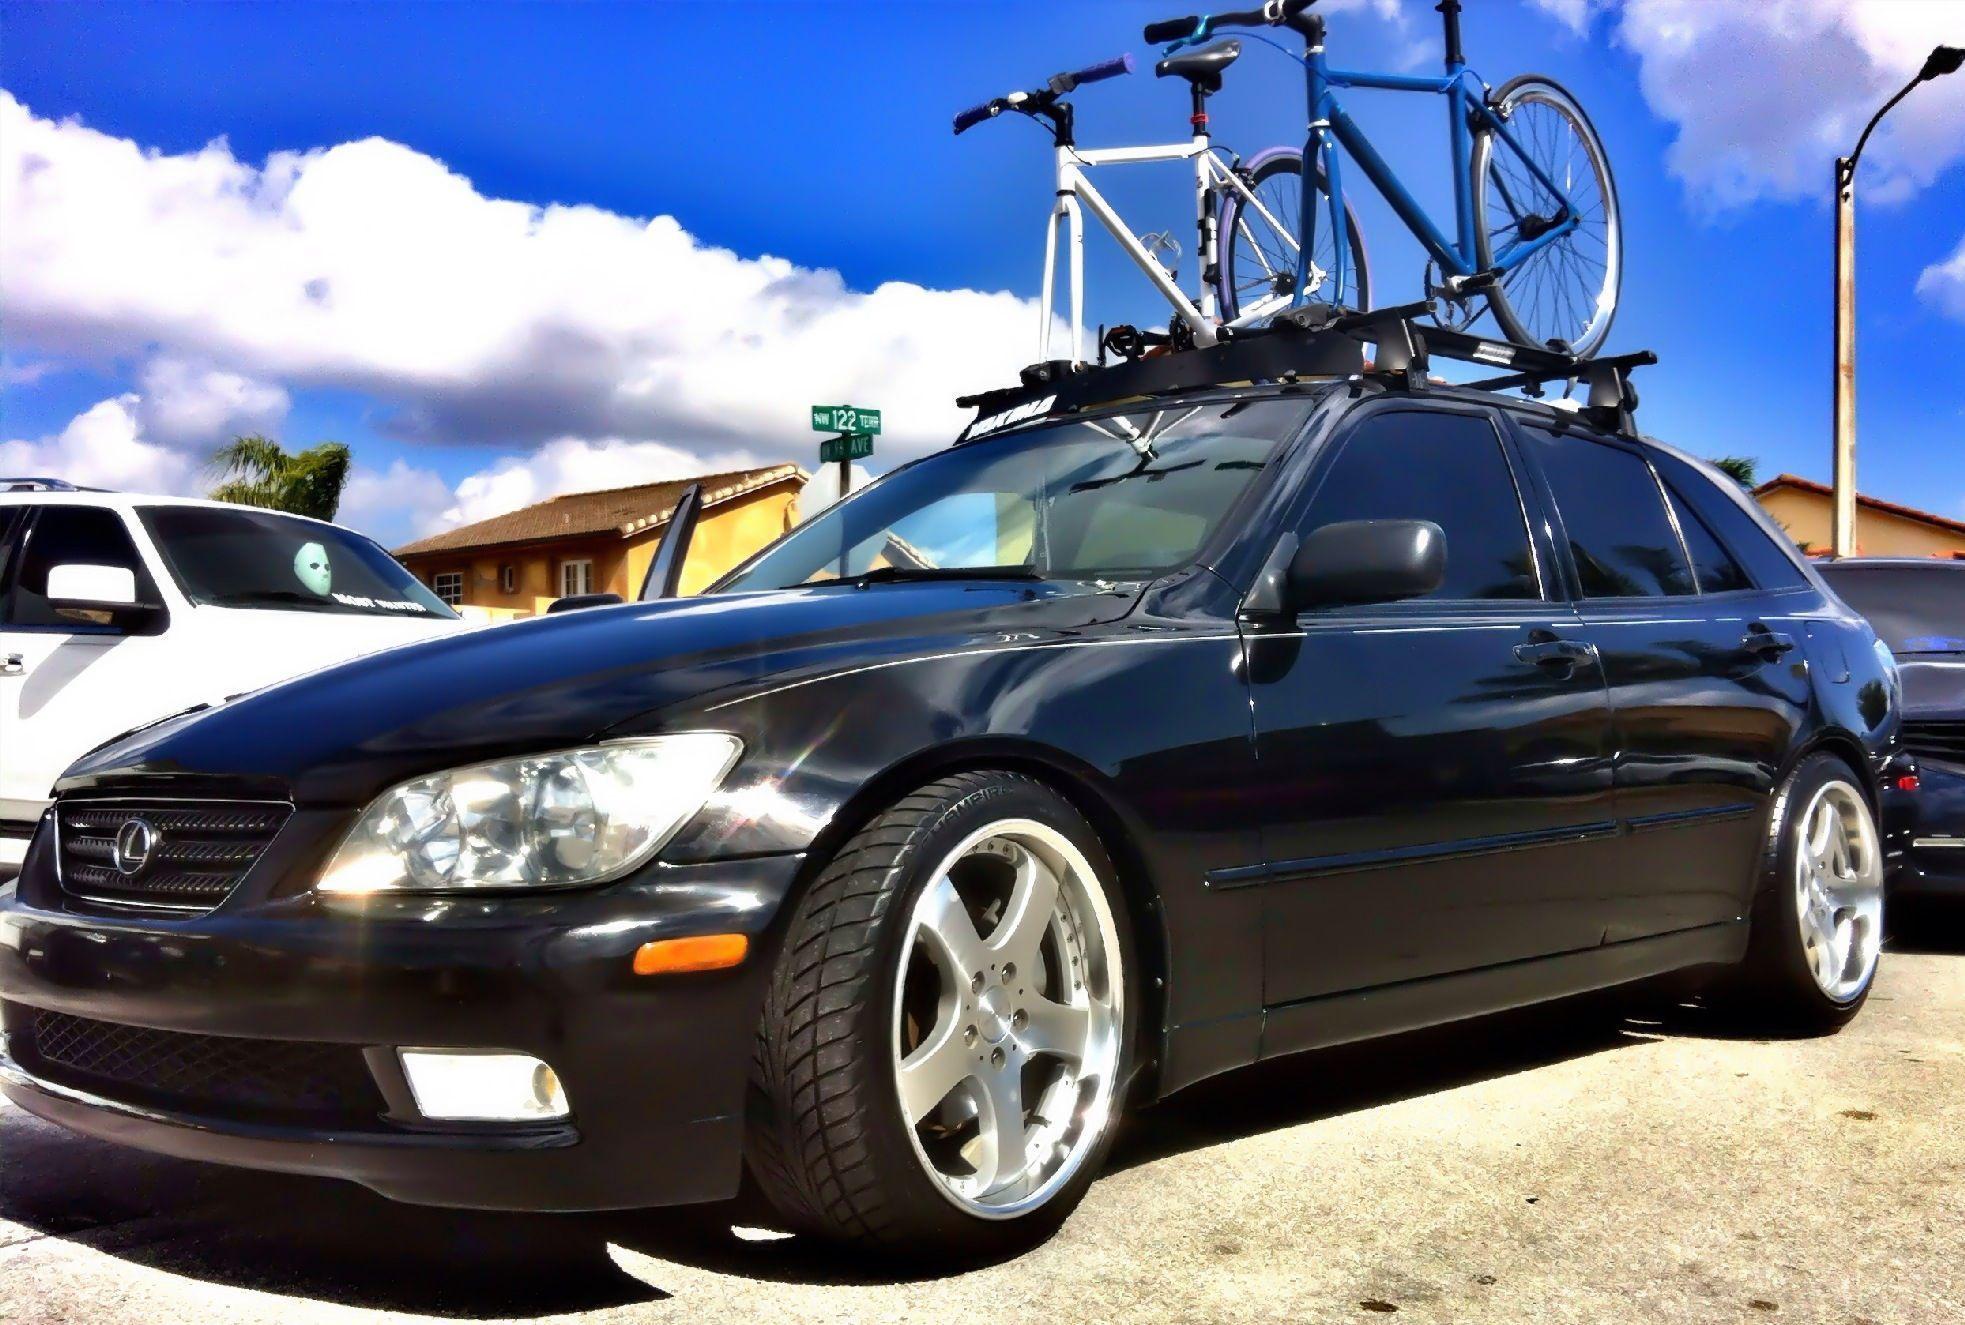 Lexus IS300 Sportcross; I love my car! ???? #lexusis300 Lexus IS300 Sportcross; I love my car! ???? #lexusis300 Lexus IS300 Sportcross; I love my car! ???? #lexusis300 Lexus IS300 Sportcross; I love my car! ???? #lexusis300 Lexus IS300 Sportcross; I love my car! ???? #lexusis300 Lexus IS300 Sportcross; I love my car! ???? #lexusis300 Lexus IS300 Sportcross; I love my car! ???? #lexusis300 Lexus IS300 Sportcross; I love my car! ???? #lexusis300 Lexus IS300 Sportcross; I love my car! ???? #lexusis #lexusis300